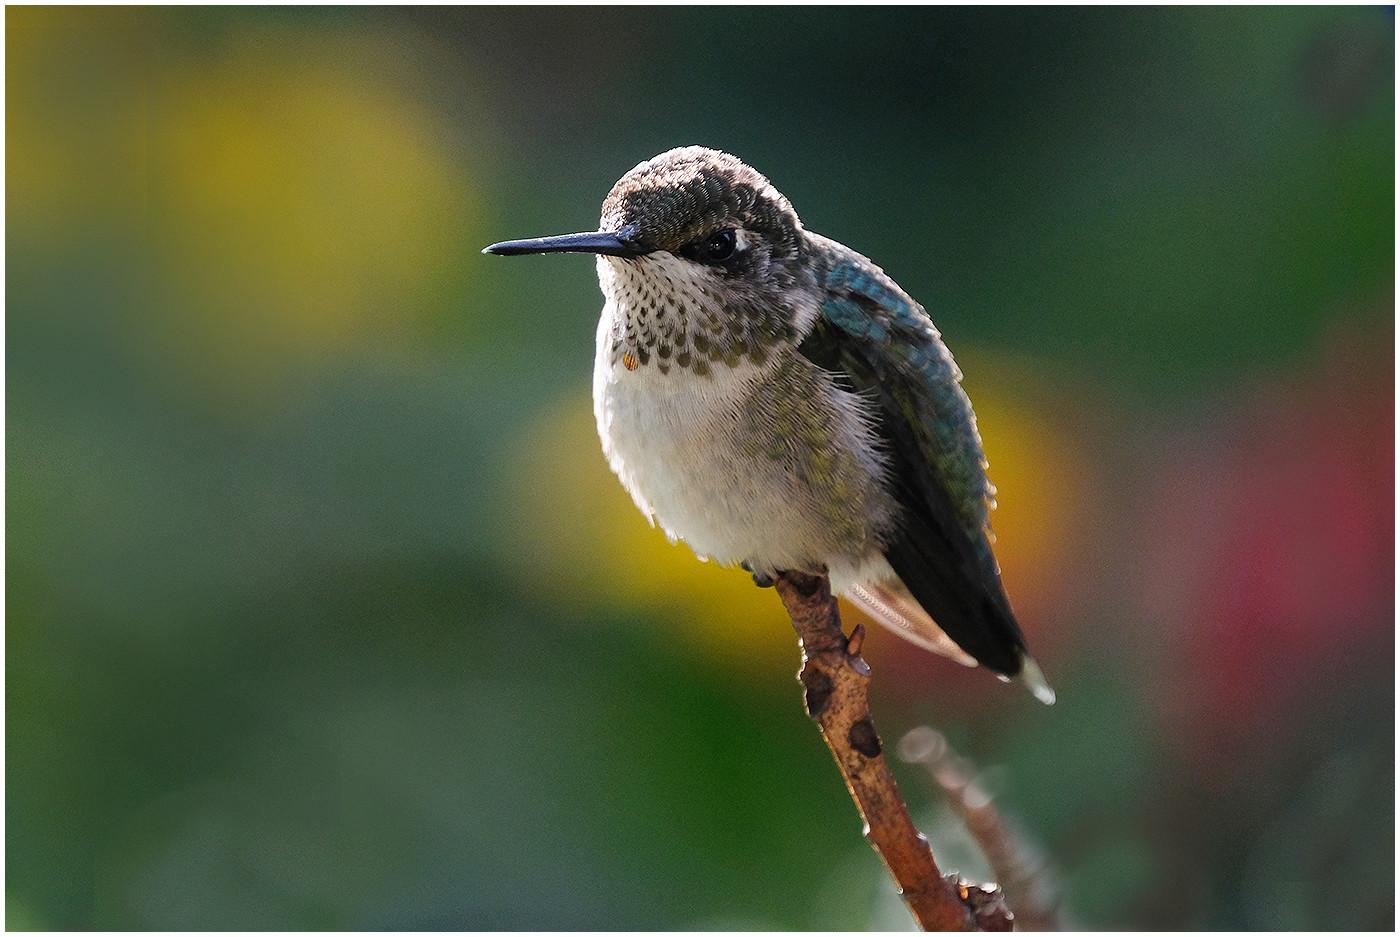 Humming Bird1  By Sunny Park  HM Class B